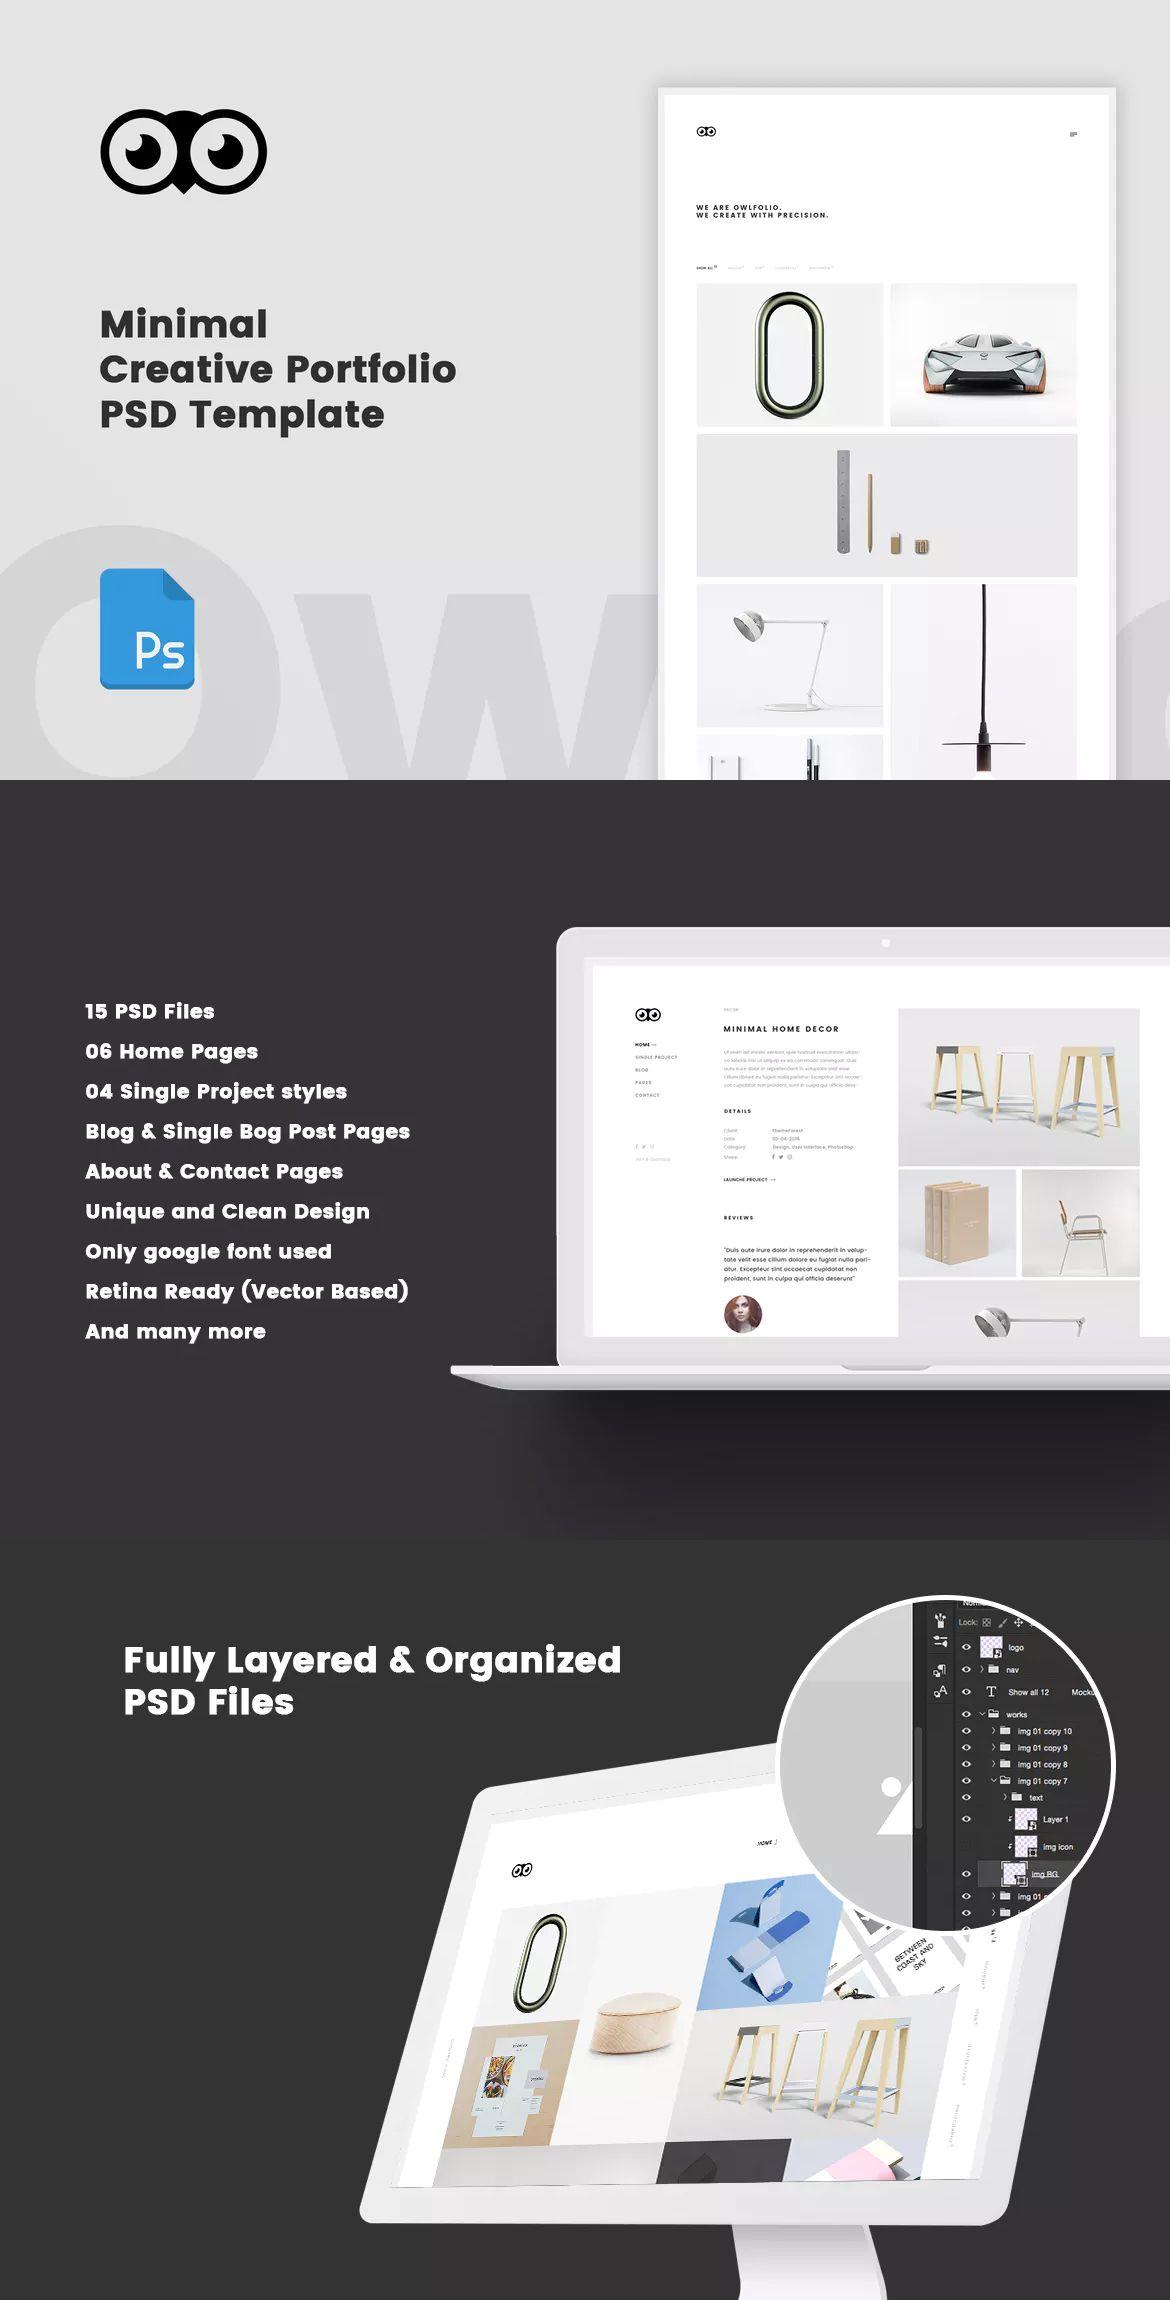 Owlfolio - Creative Portfolio Template PSD | Website Design ...